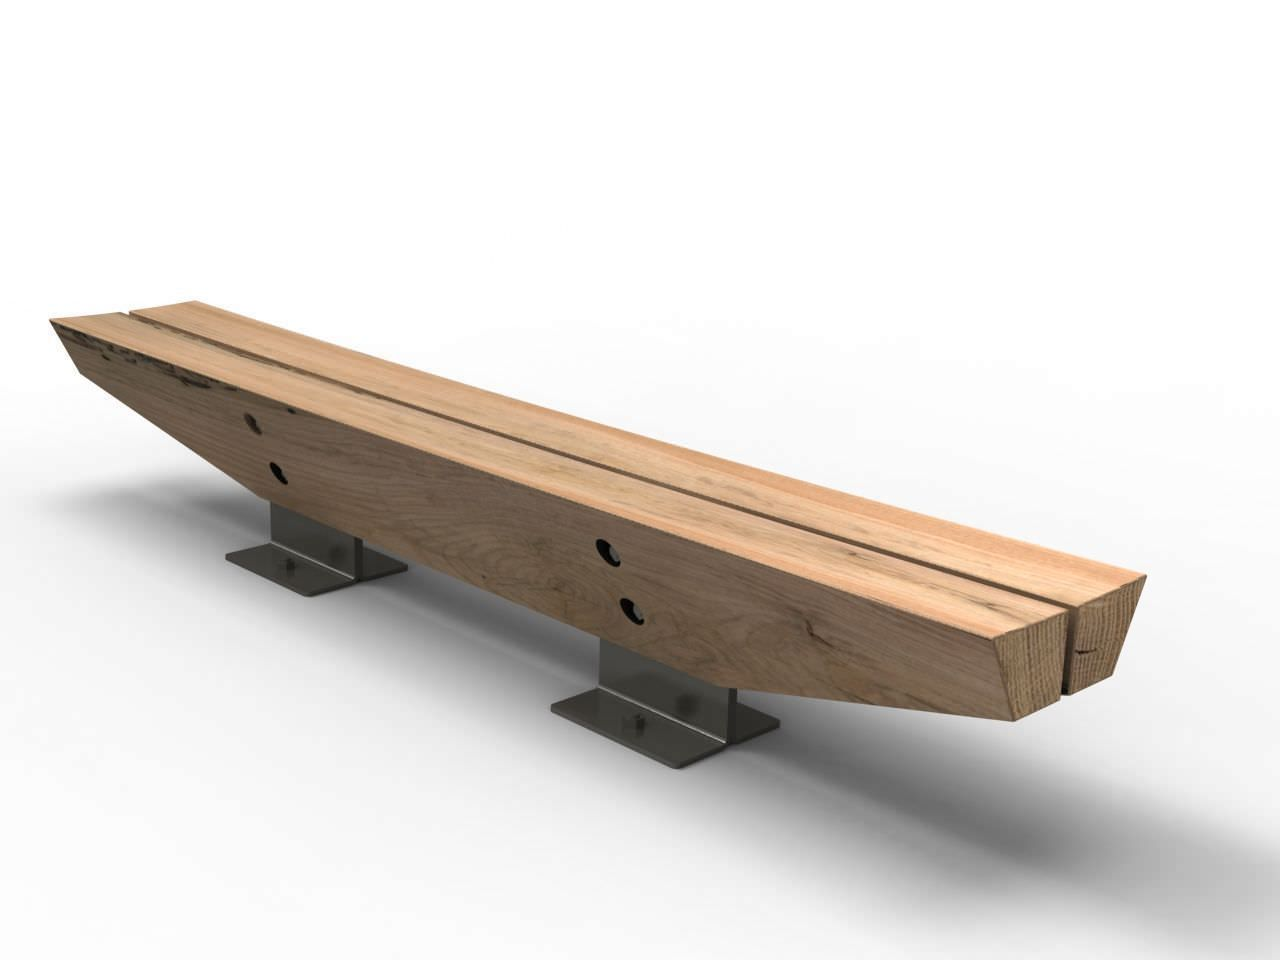 urban furniture designs. Stool Chair · Rustic Industrial FurnitureOutdoor Furniture DesignUrban Urban Designs